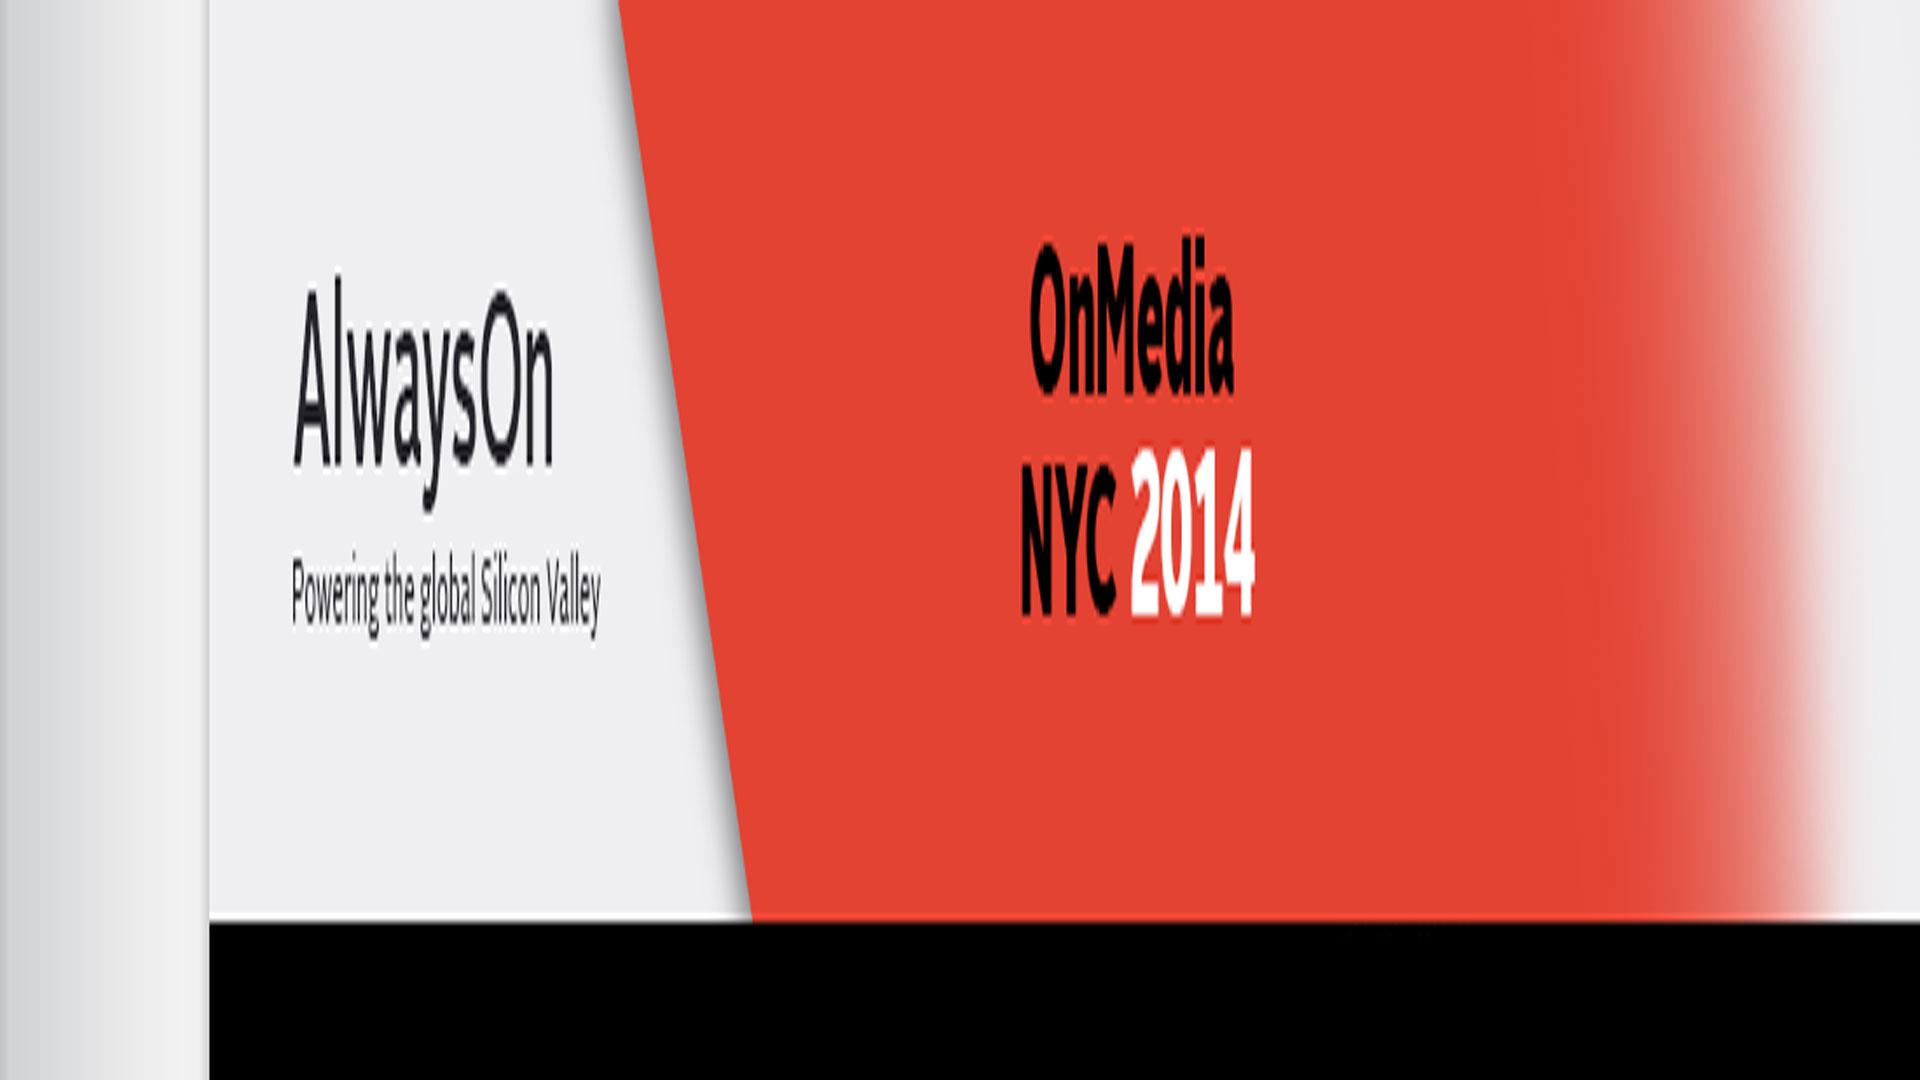 OnMedia NYC 2014